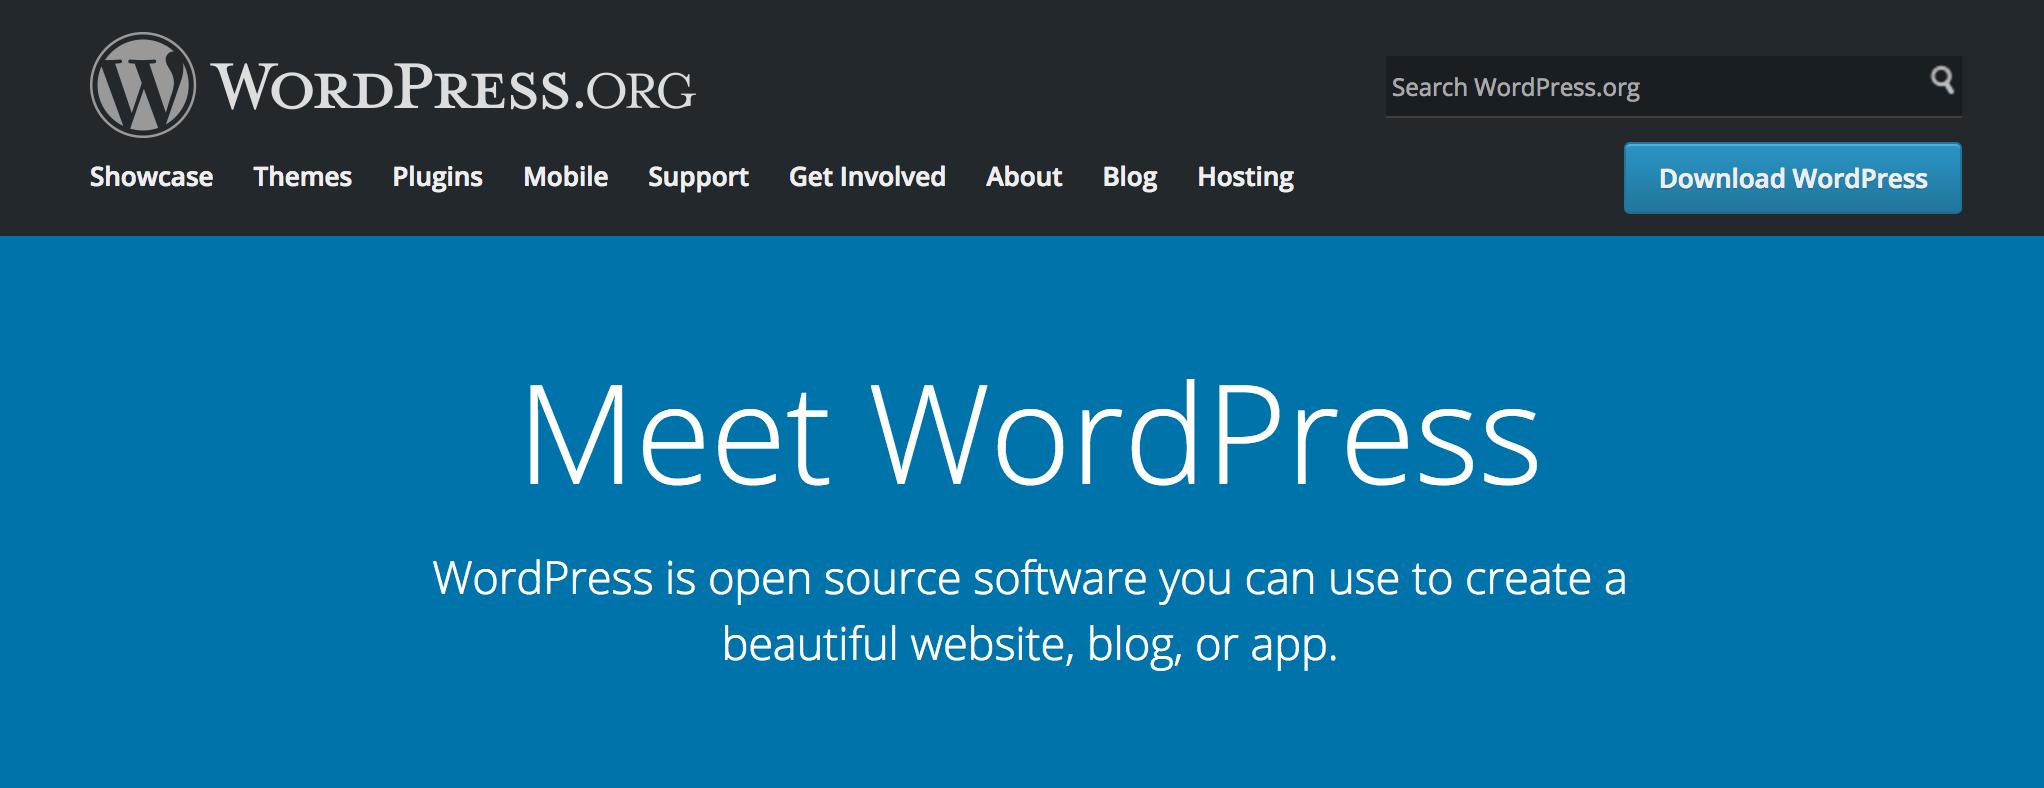 Starting a Blog on WordPress.org - Blogging Platform